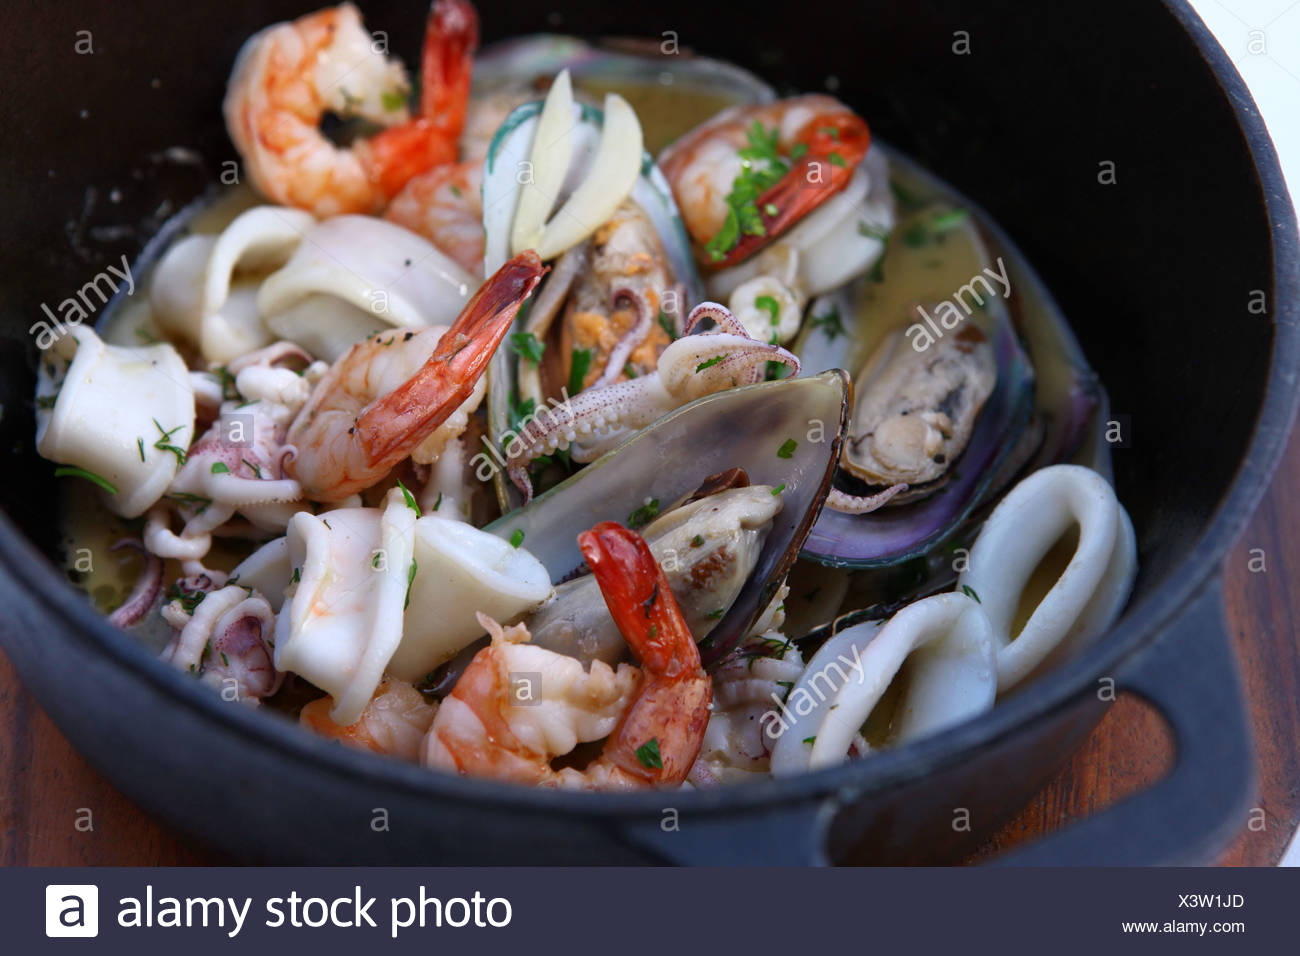 Seafood Bouillabaisse with shrimps, calamari and mussel - Stock Image